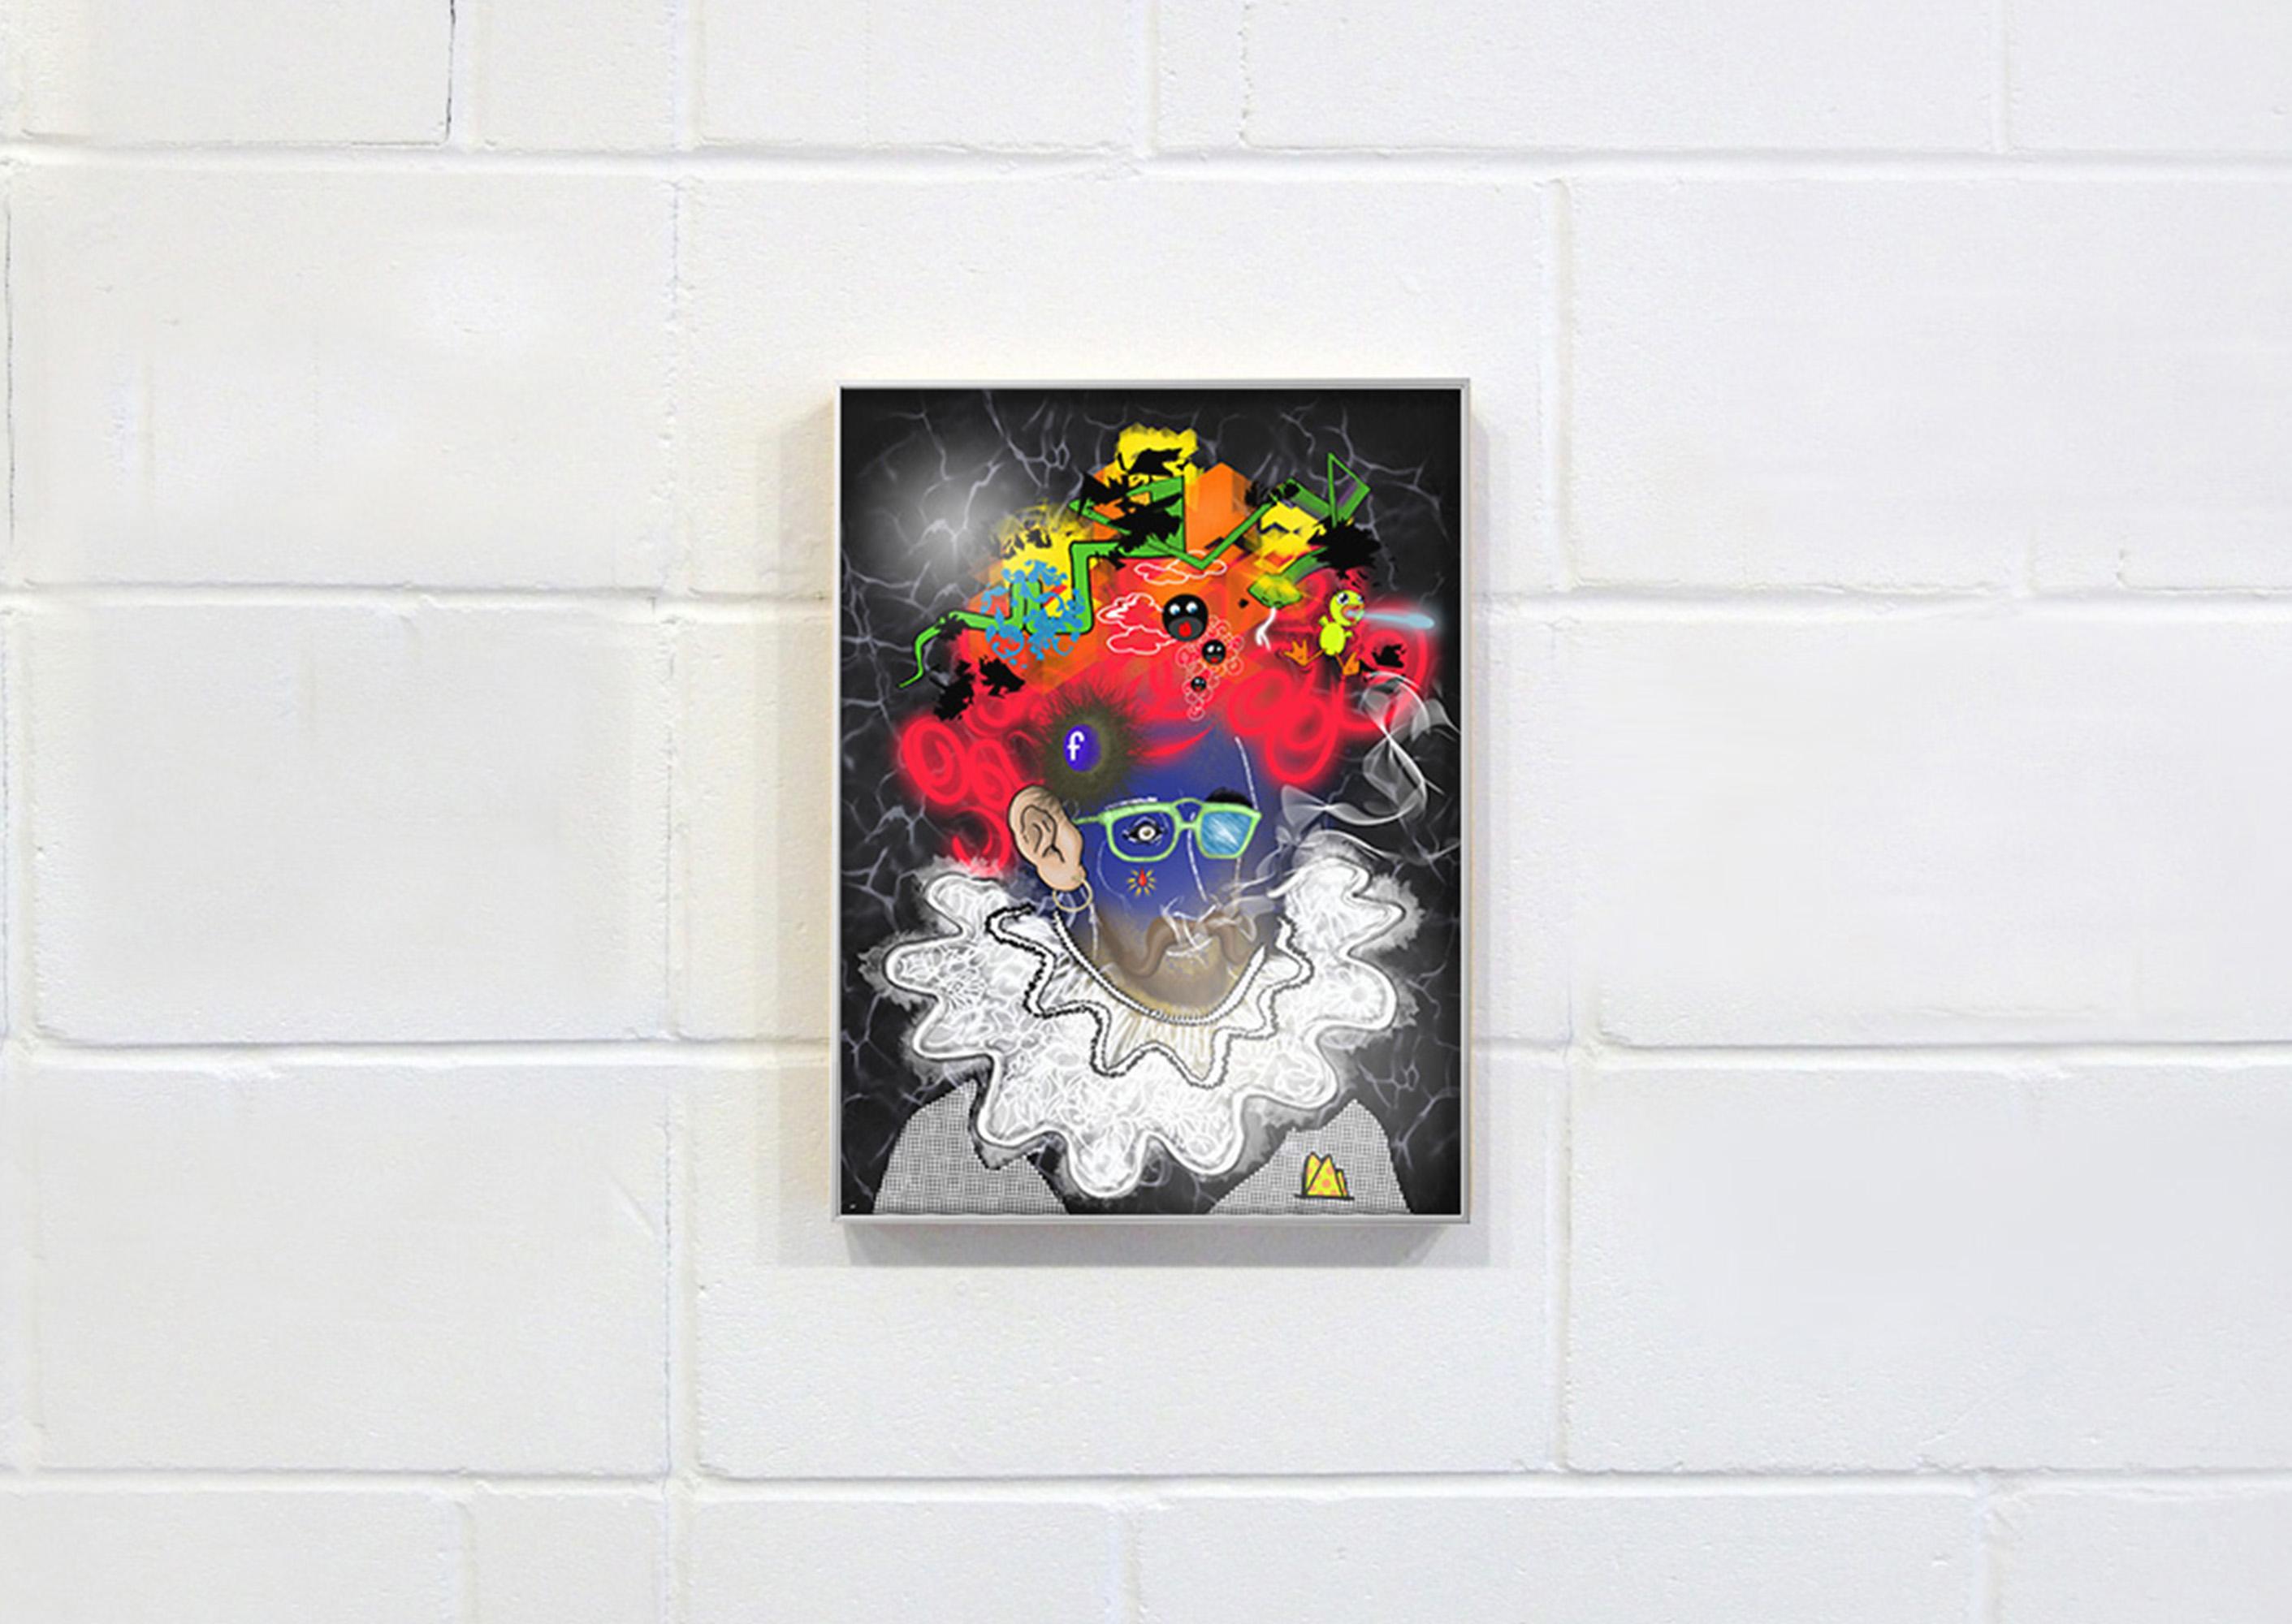 Galleria 04 Ixixuno